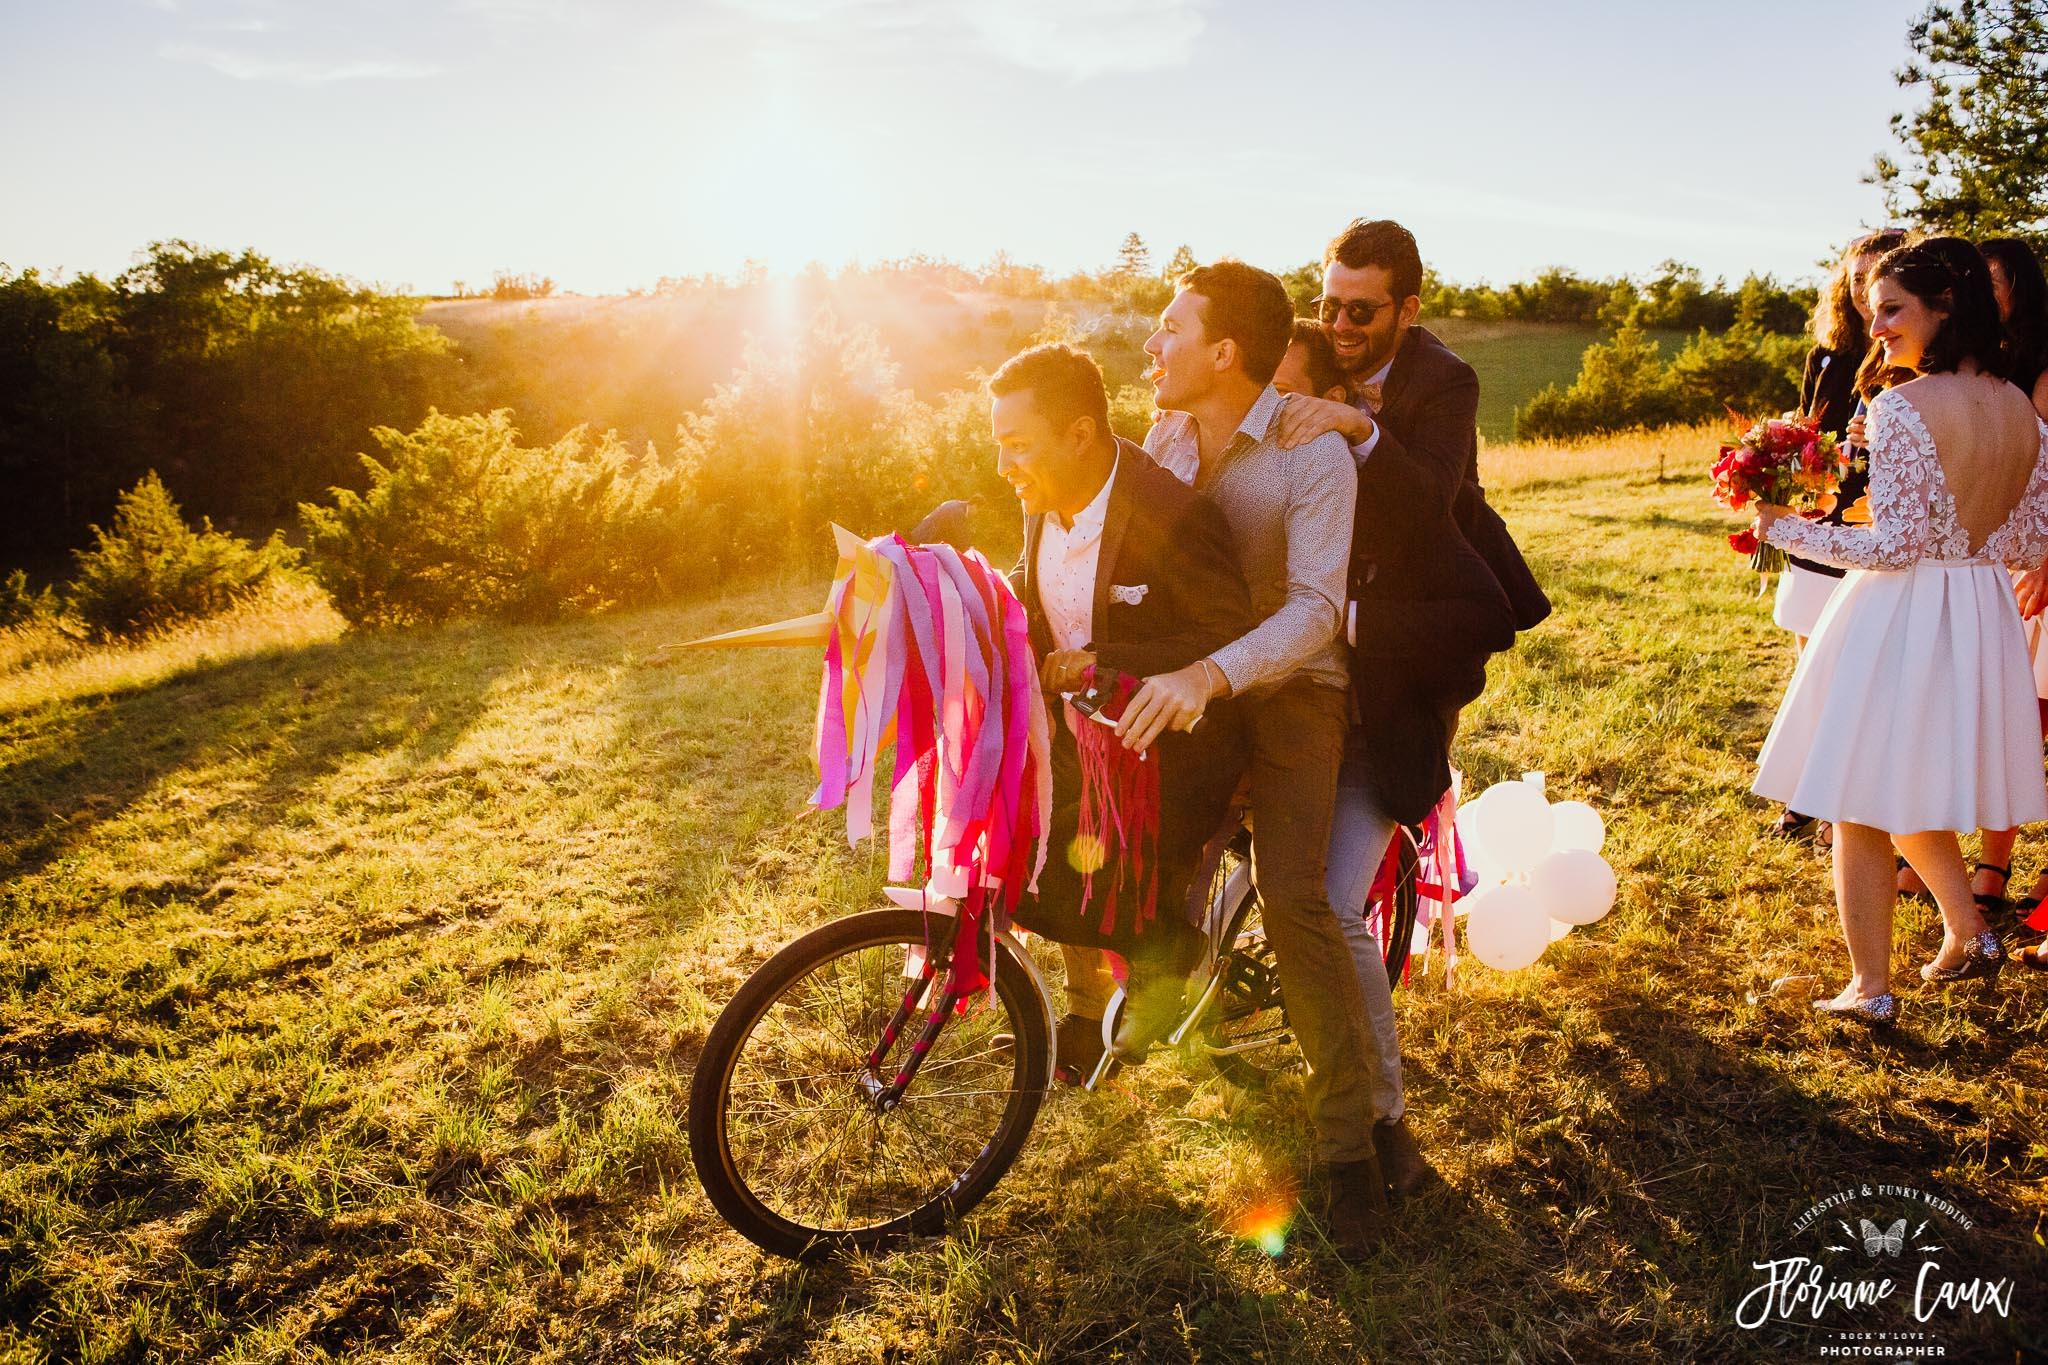 photos-de-groupes-originales-mariage-cahors-golden-hour-13